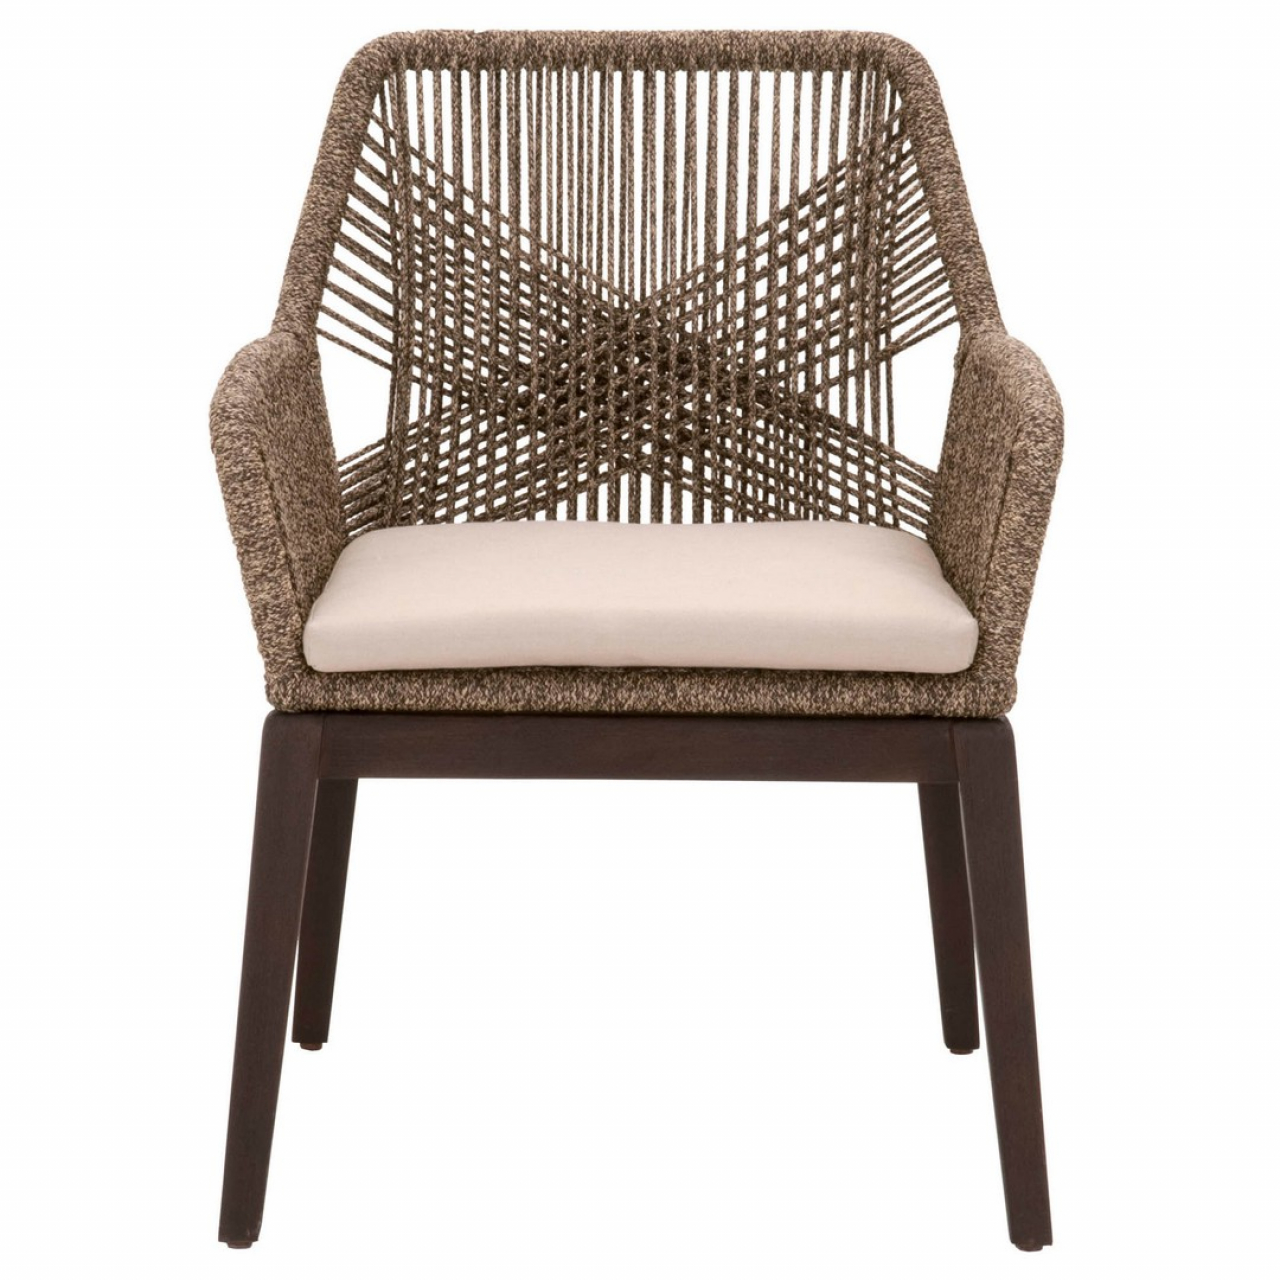 Loom+Arm+Chair+-+Mocha+Rustic+Java+-+1.jpg